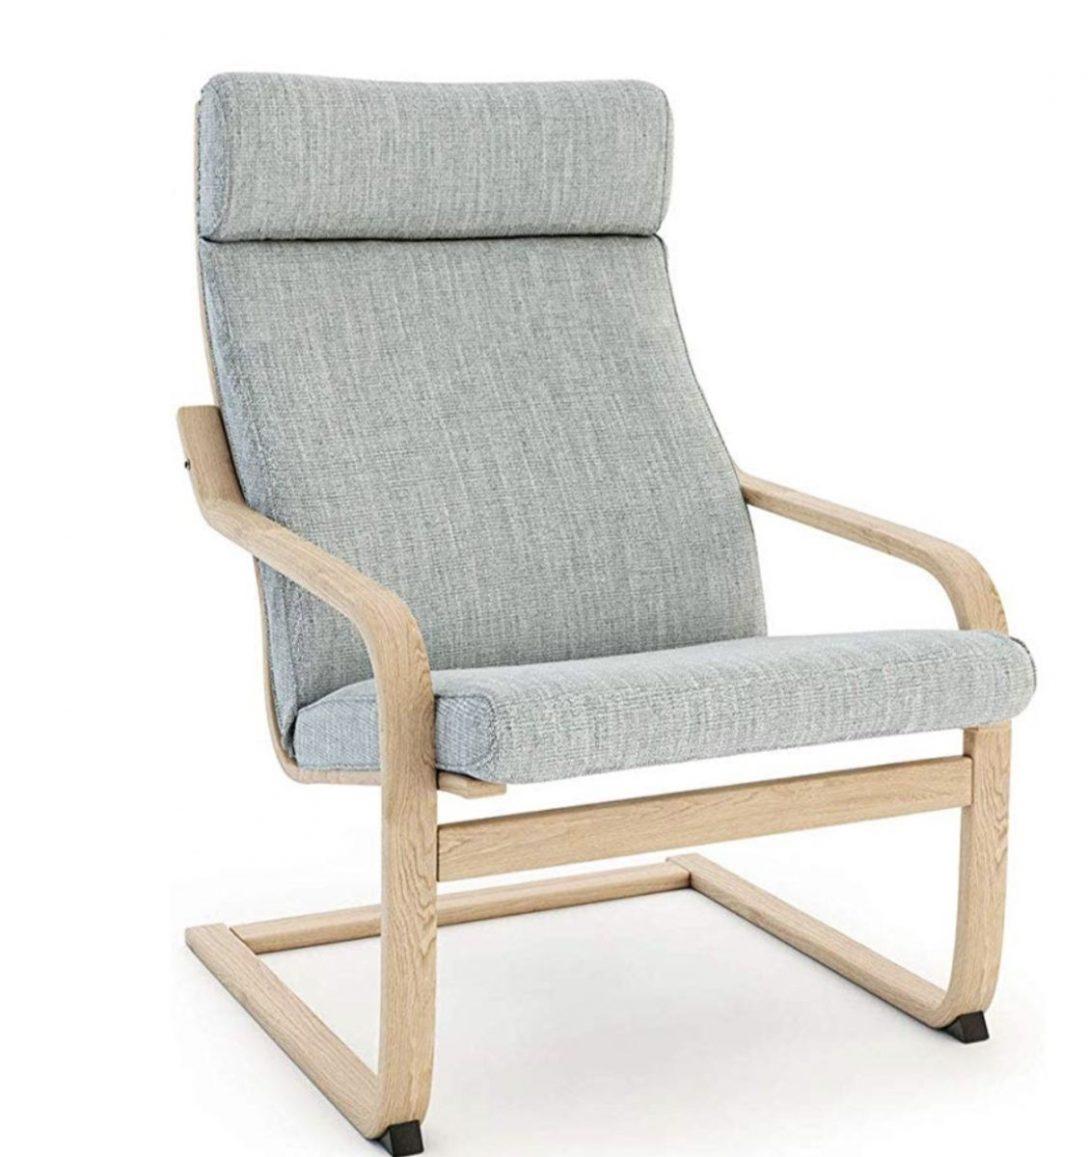 Large Size of Sessel Ikea Schwingsessel Neuwertig Reutte Kleinanzeigen Relaxsessel Garten Küche Kaufen Lounge Betten Bei Kosten 160x200 Wohnzimmer Schlafzimmer Sofa Mit Wohnzimmer Sessel Ikea